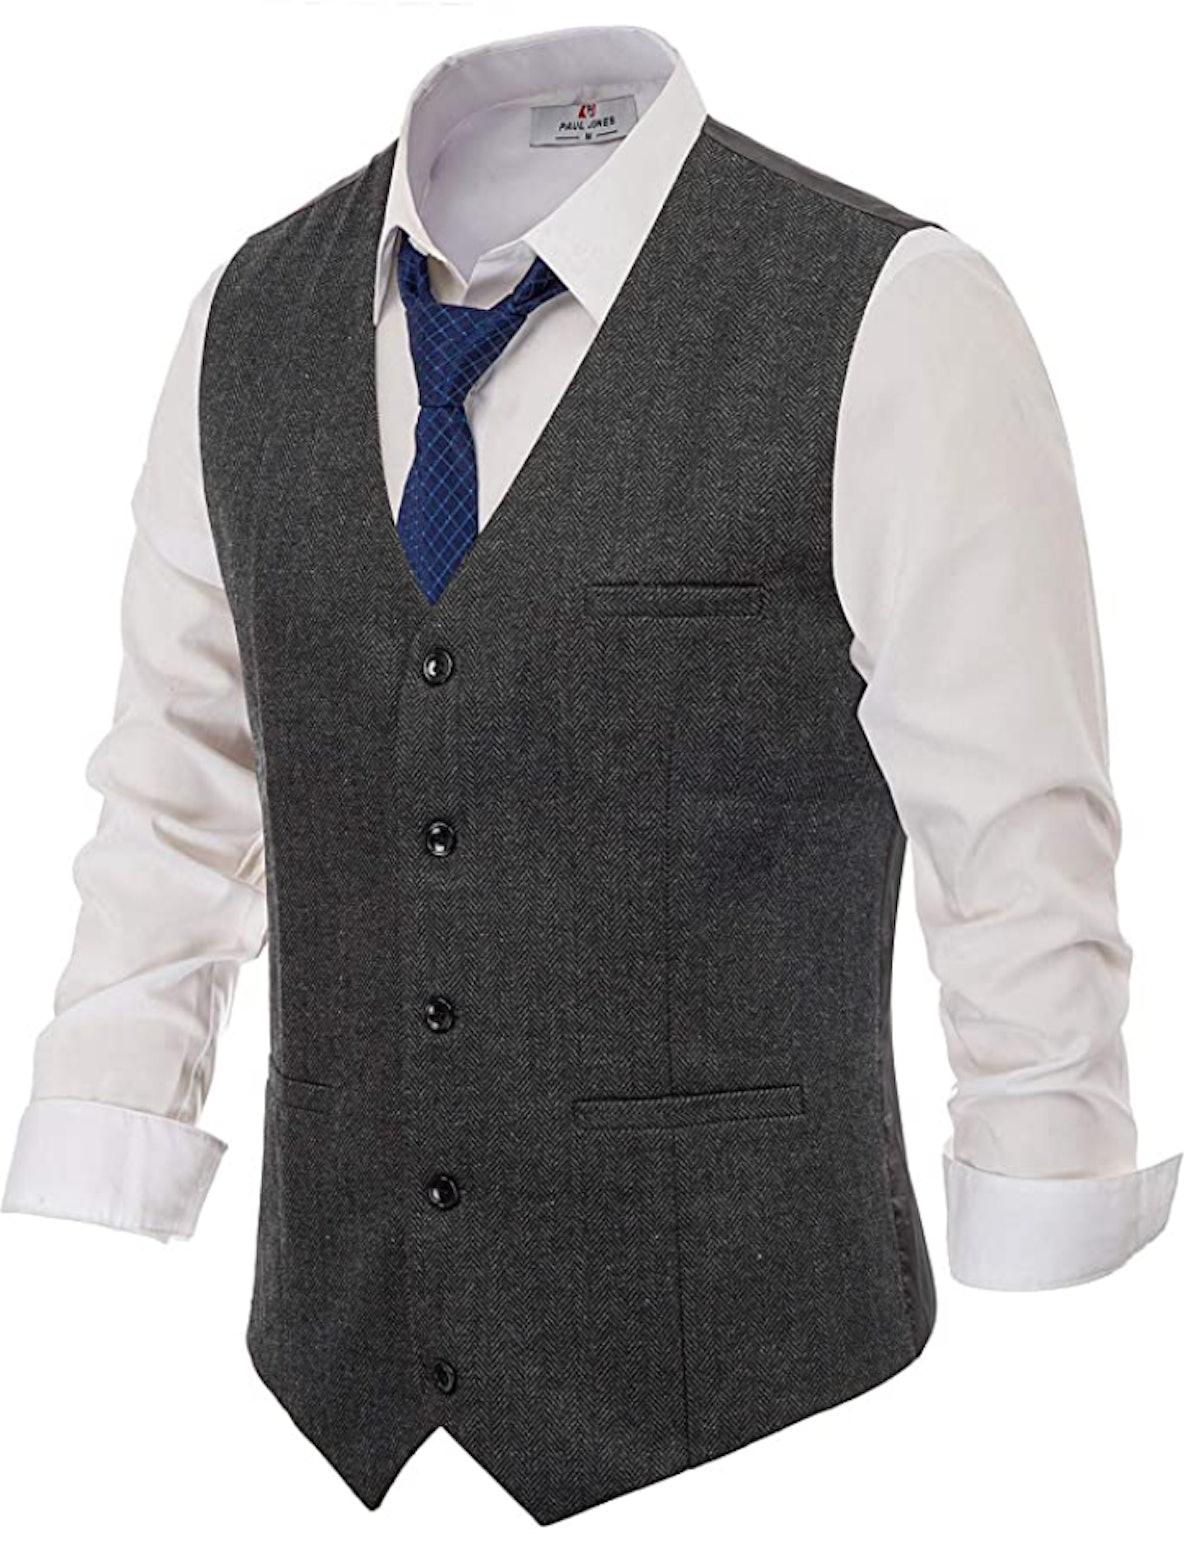 PAUL JONES Men's British Herringbone Tweed Waistcoat